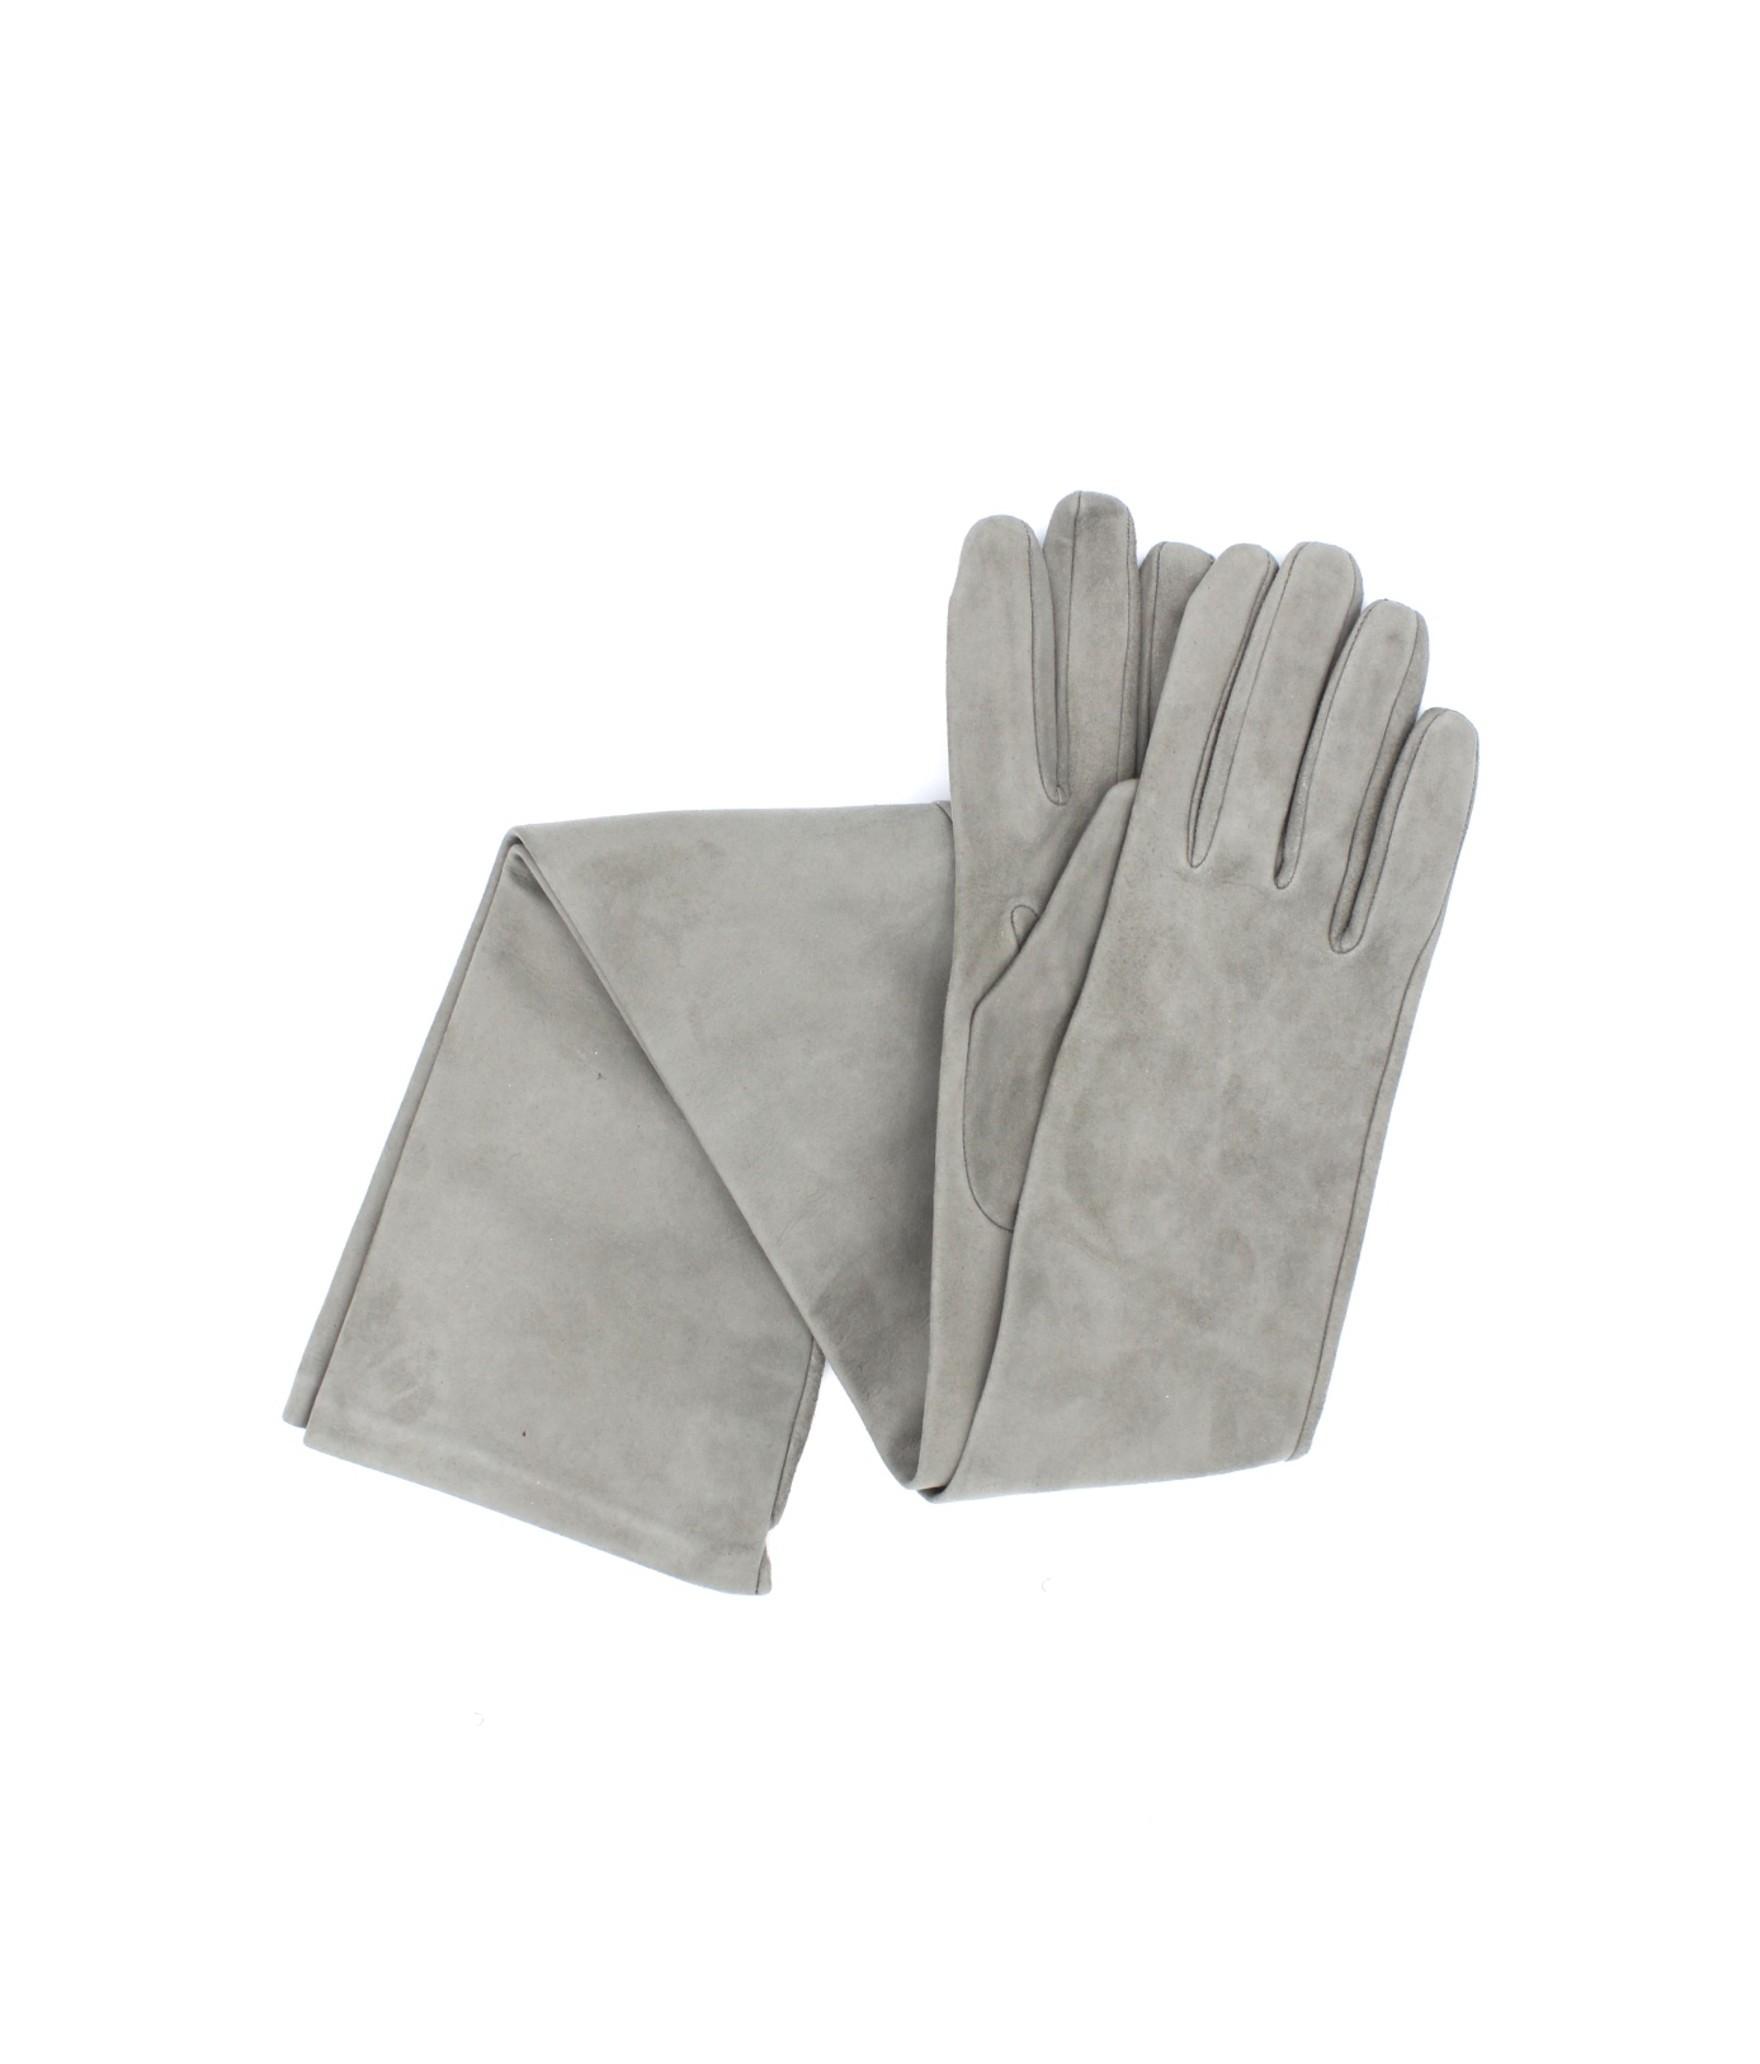 Suede Nappa leather gloves 16bt Silk lined Pearl Grey Sermoneta